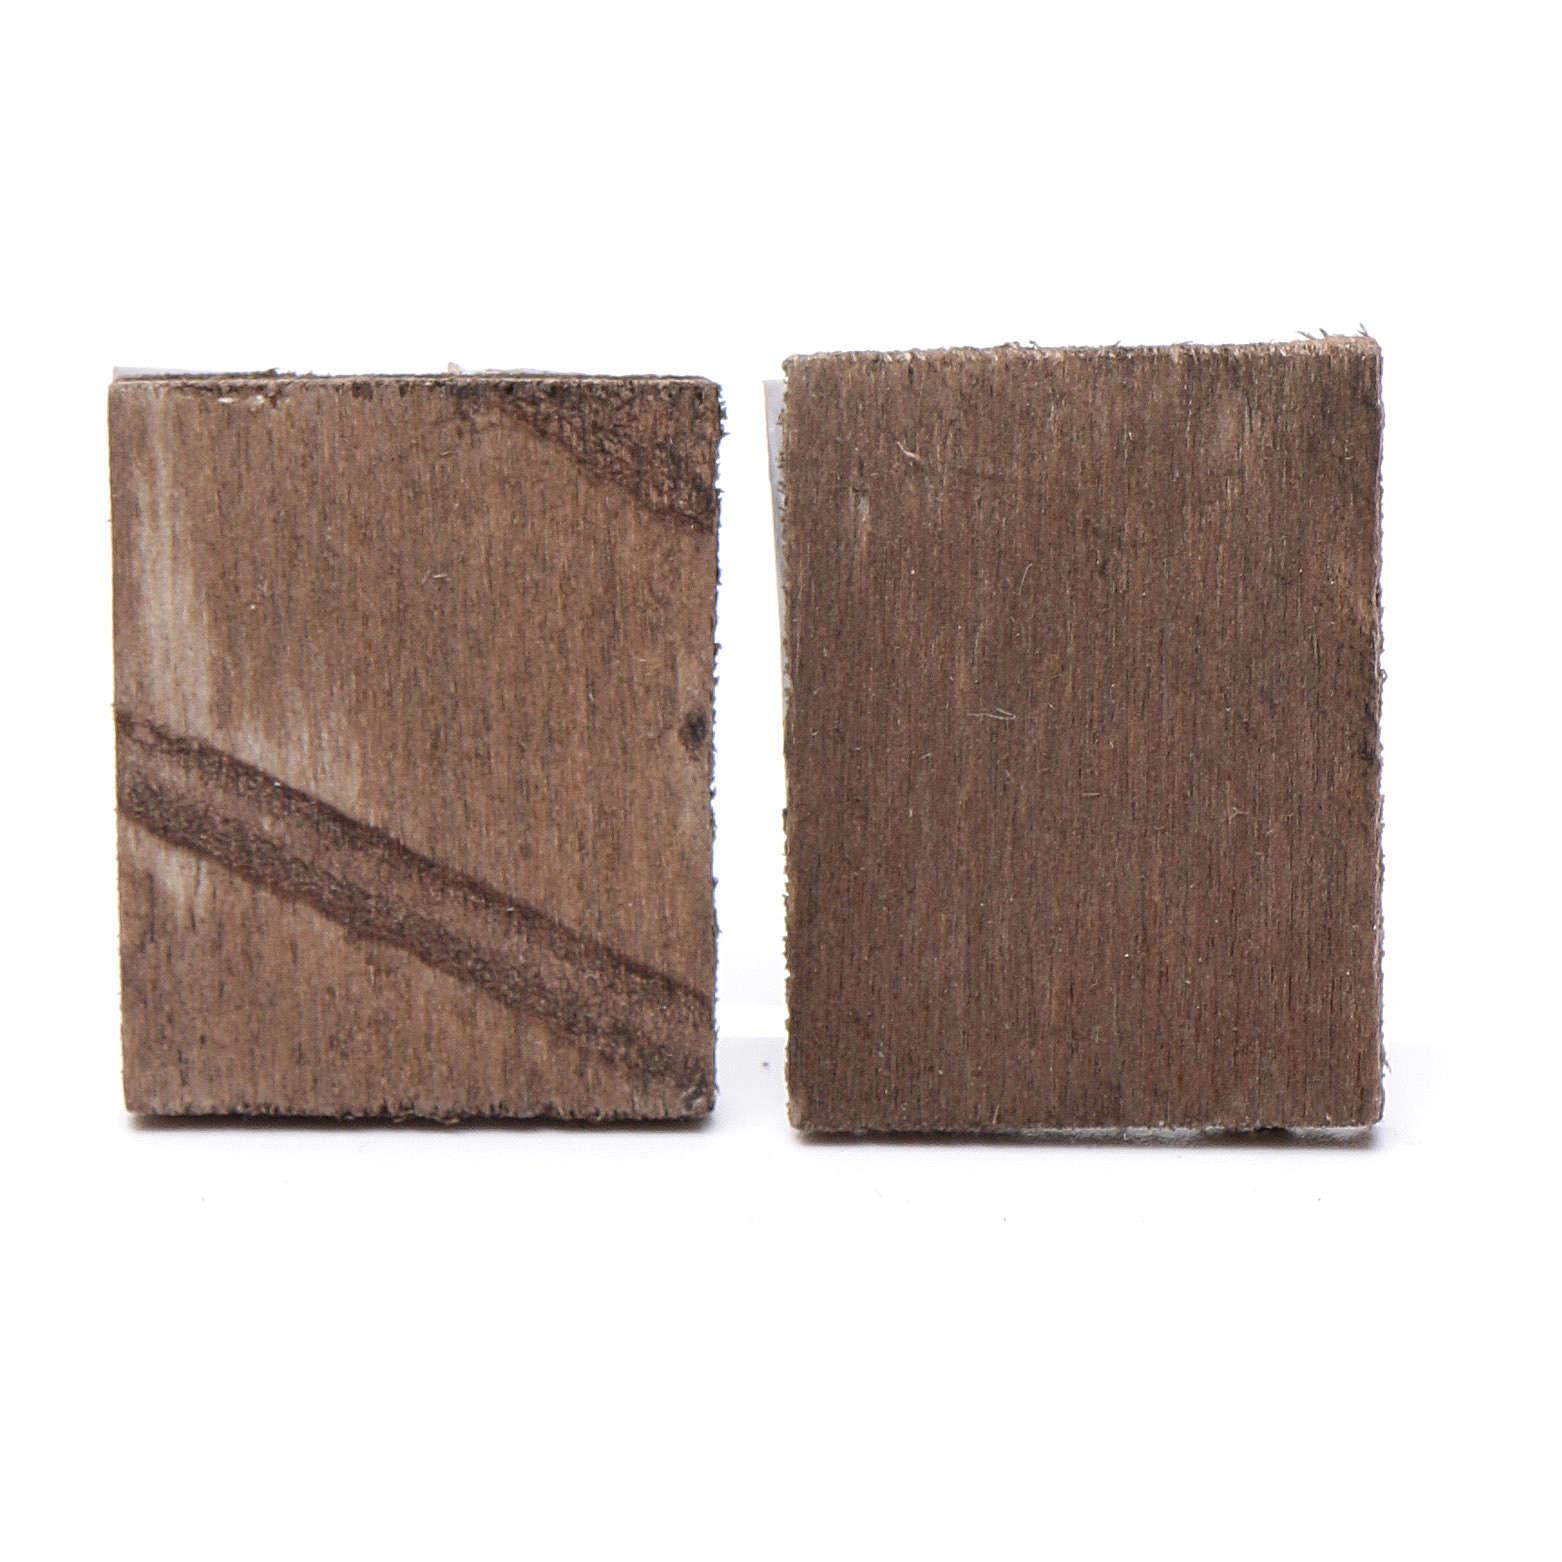 Cuadro madera belén 2 piezas 4x3.5 4